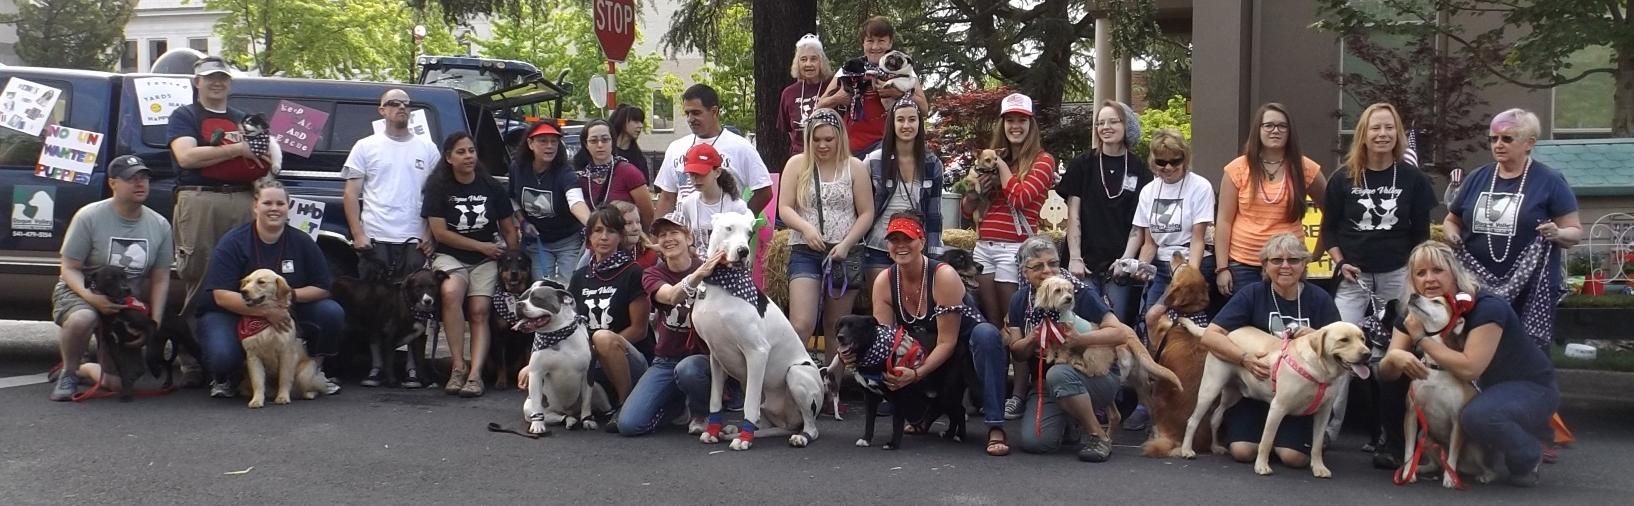 2014_Boatnik_Volunteers